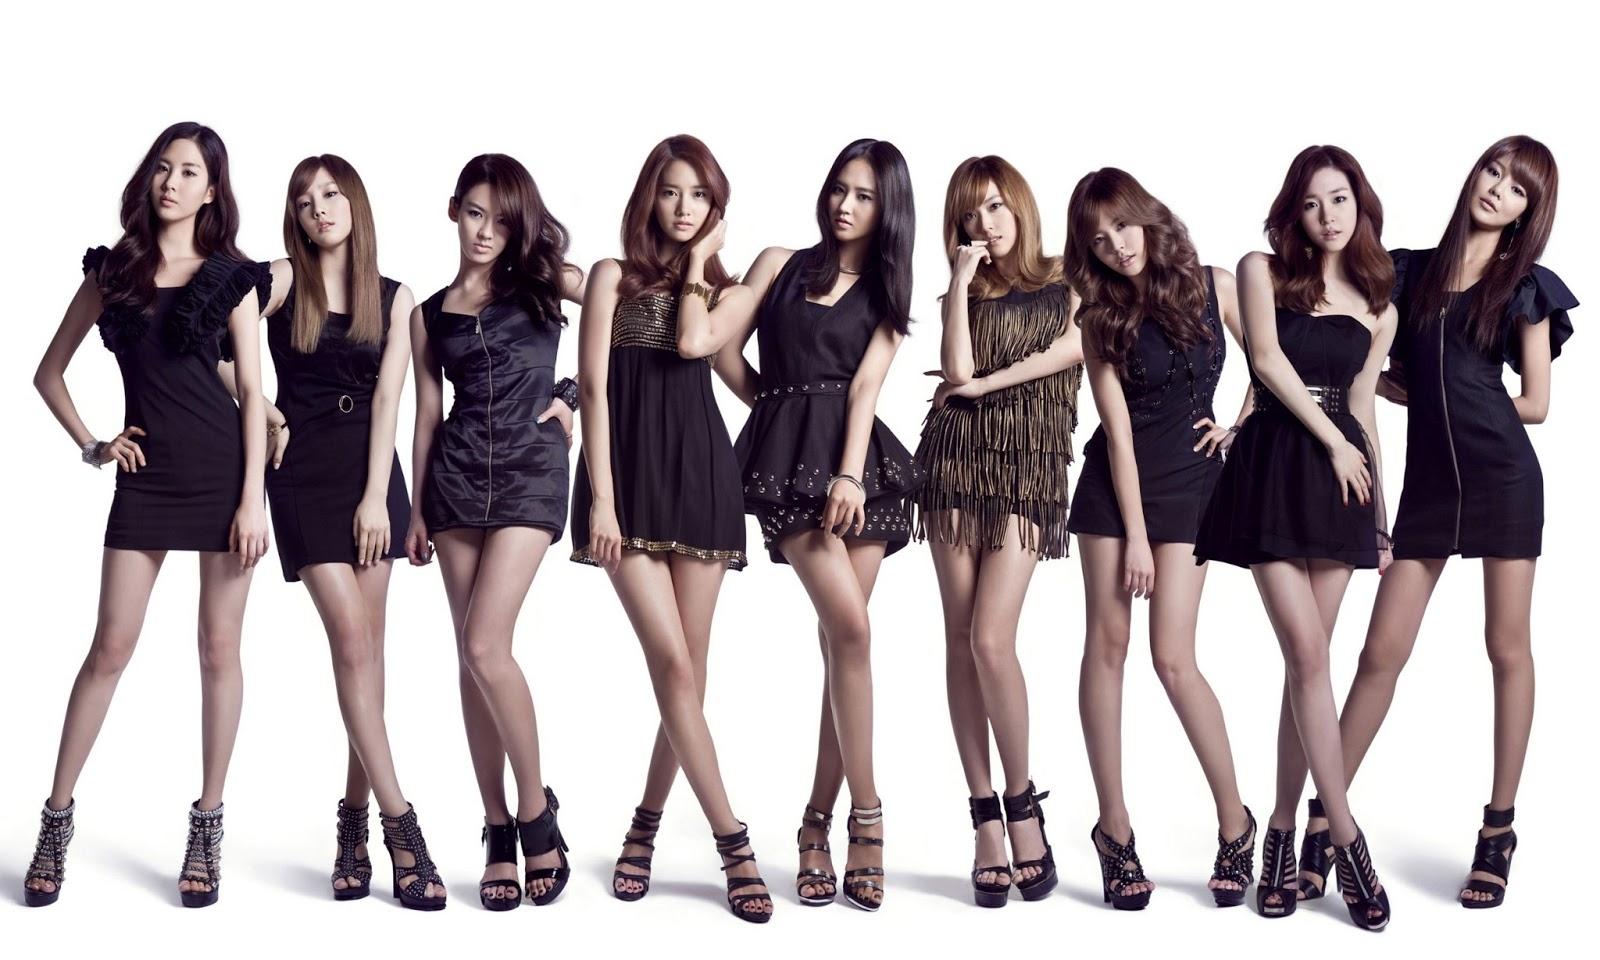 girls generation hd - photo #3